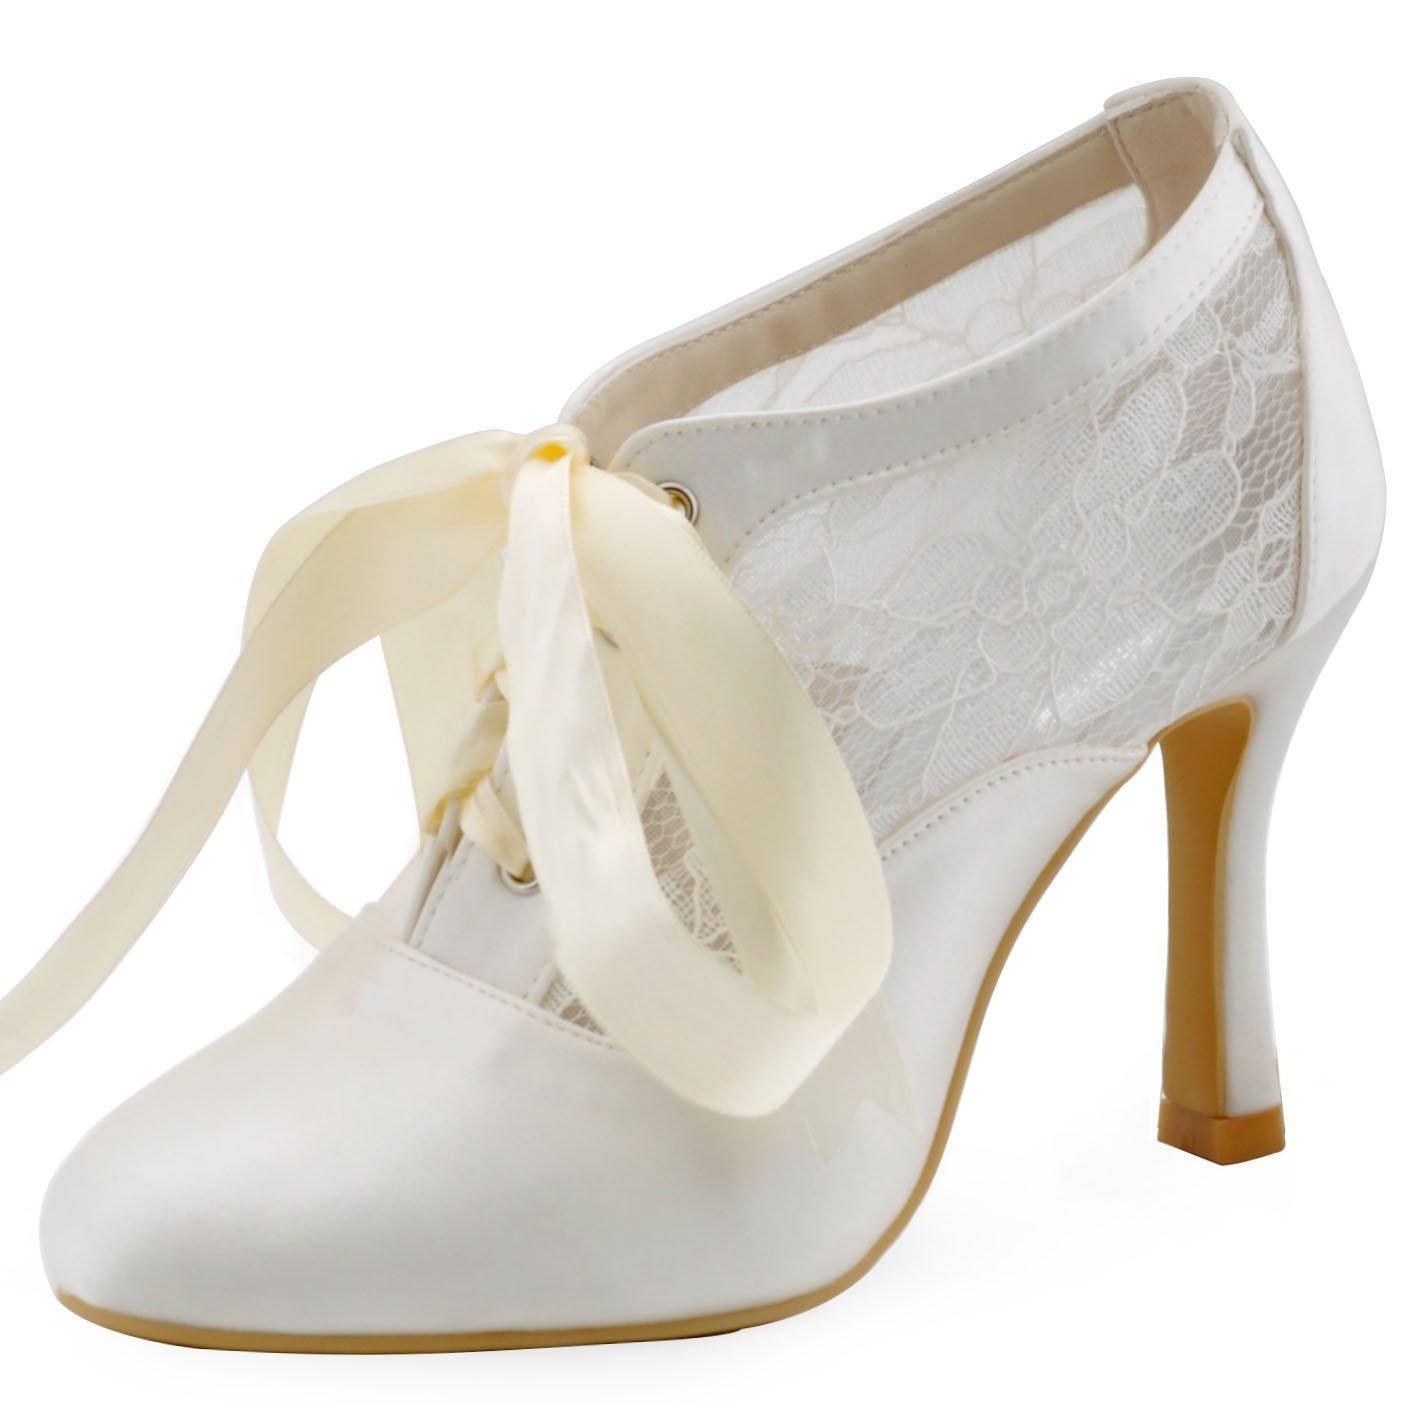 ElegantPark HC1529 Women Closed Toe Bootie High Heel Pumps Lace Wedding Dress Ivory US 7